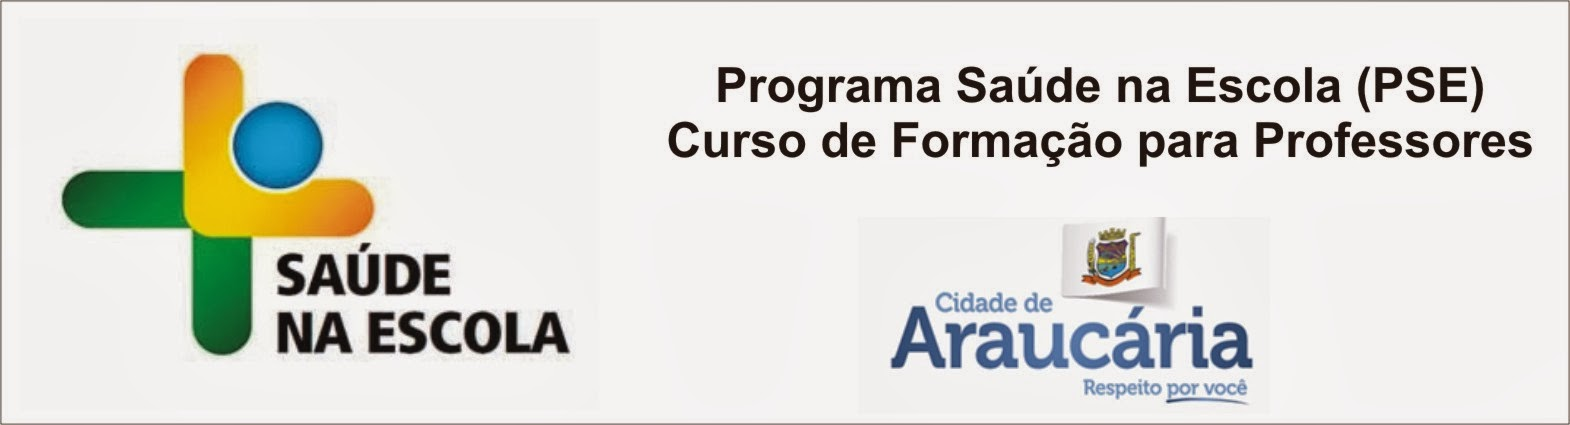 PROGRAMA SAÚDE NA ESCOLA (PSE) ARAUCÁRIA